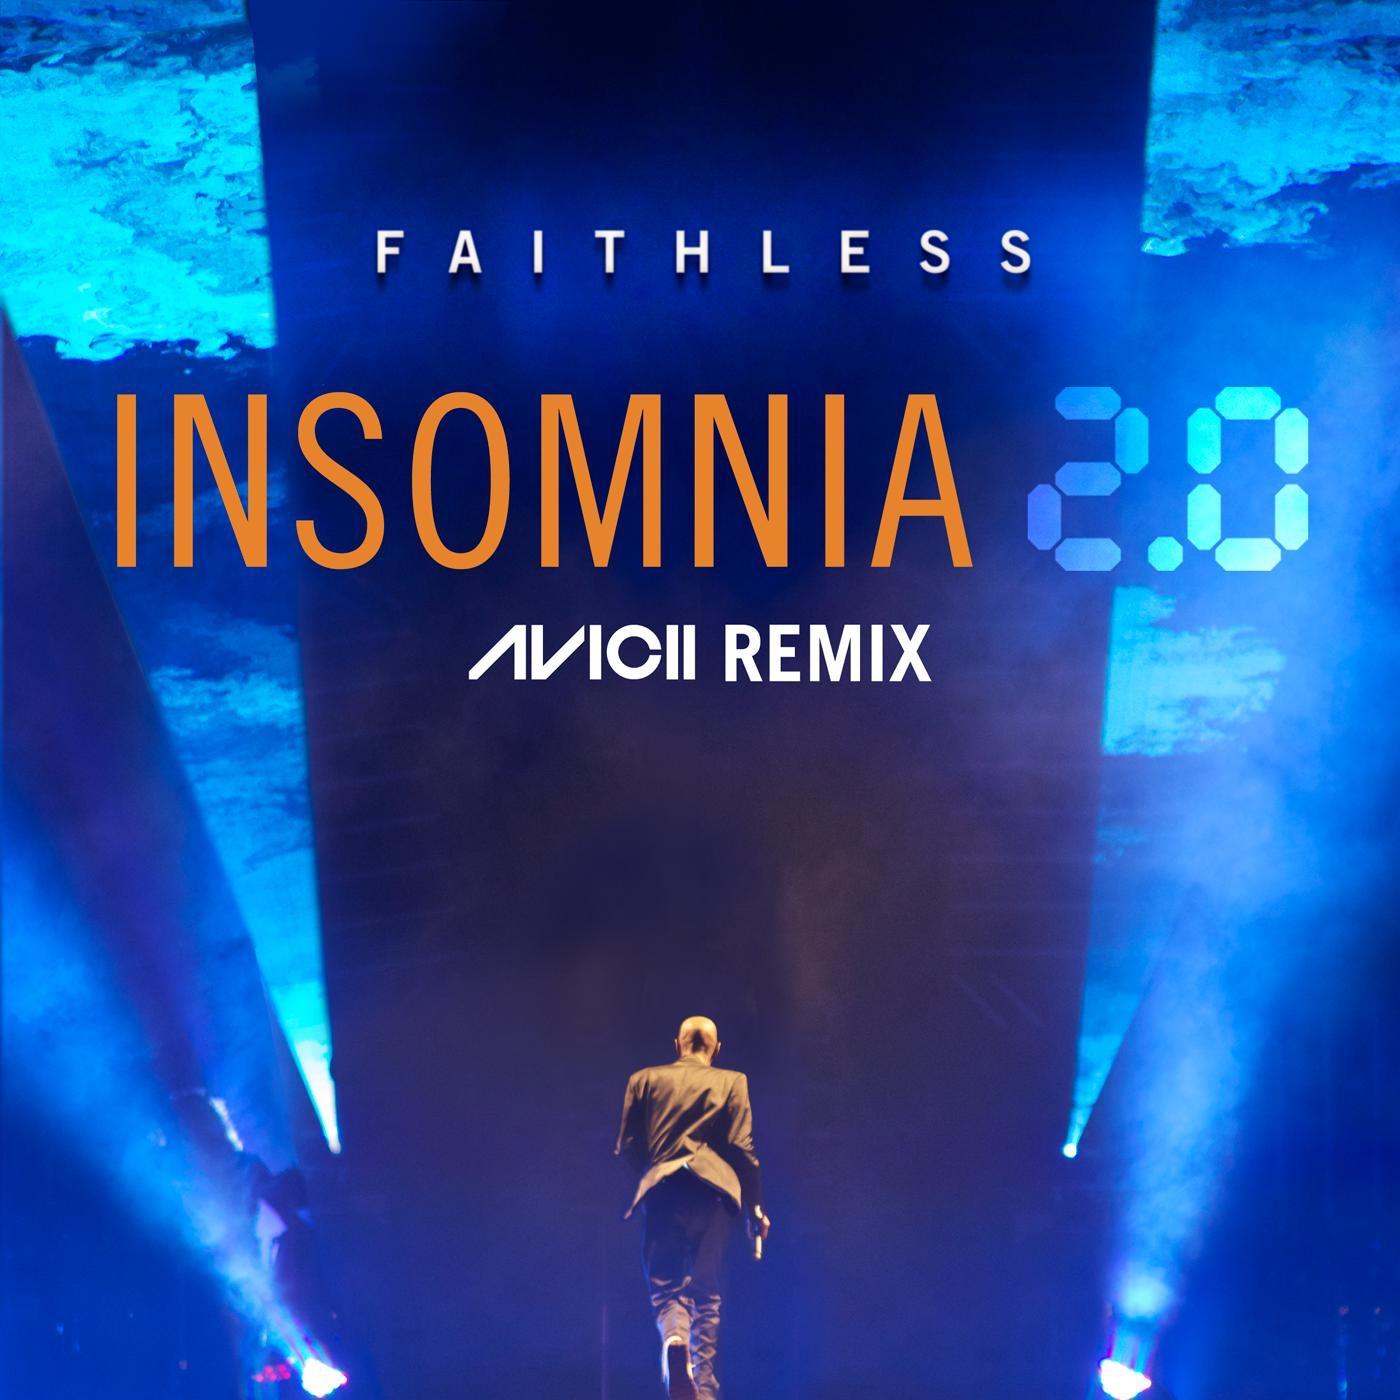 Insomnia 2.0 (Avicii Remix) [Radio Edit] - Single